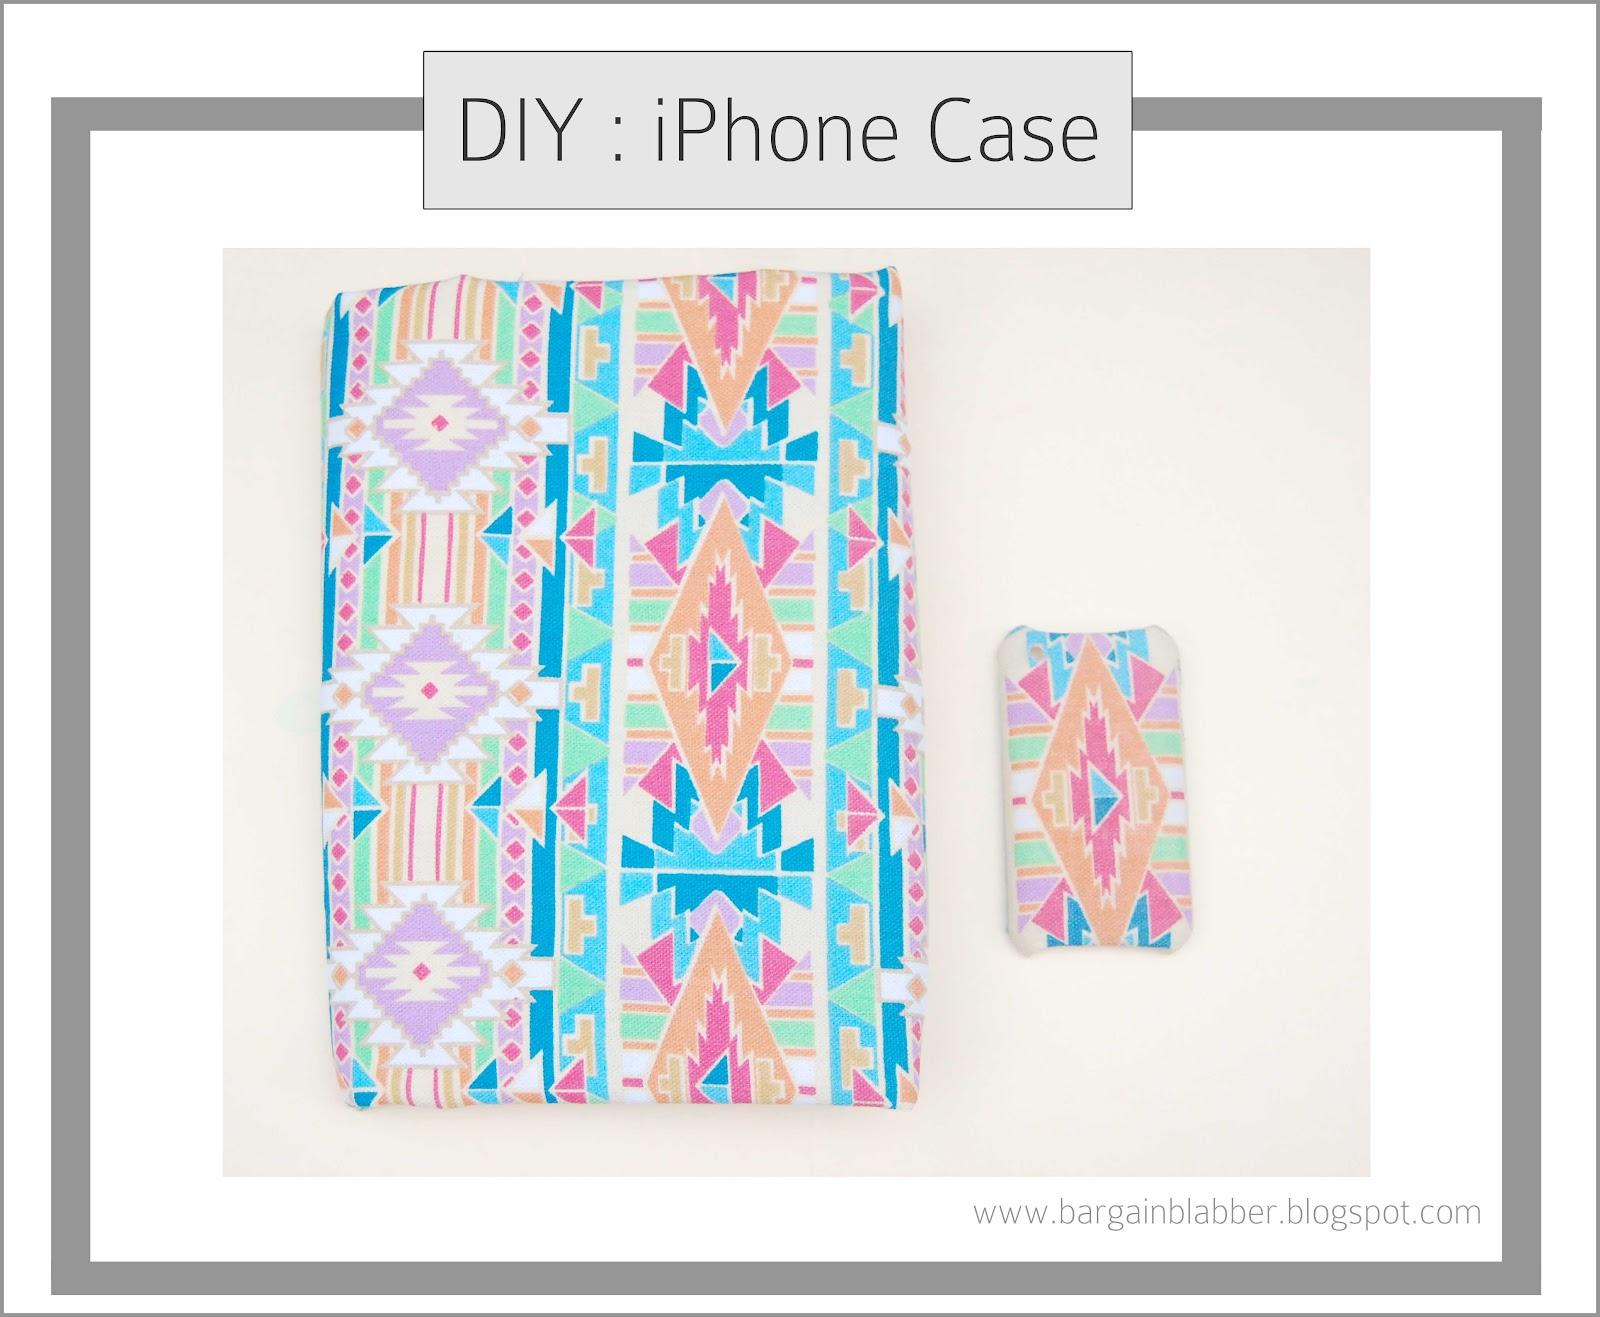 Diy iphone case bargain blabber for Homemade iphone case